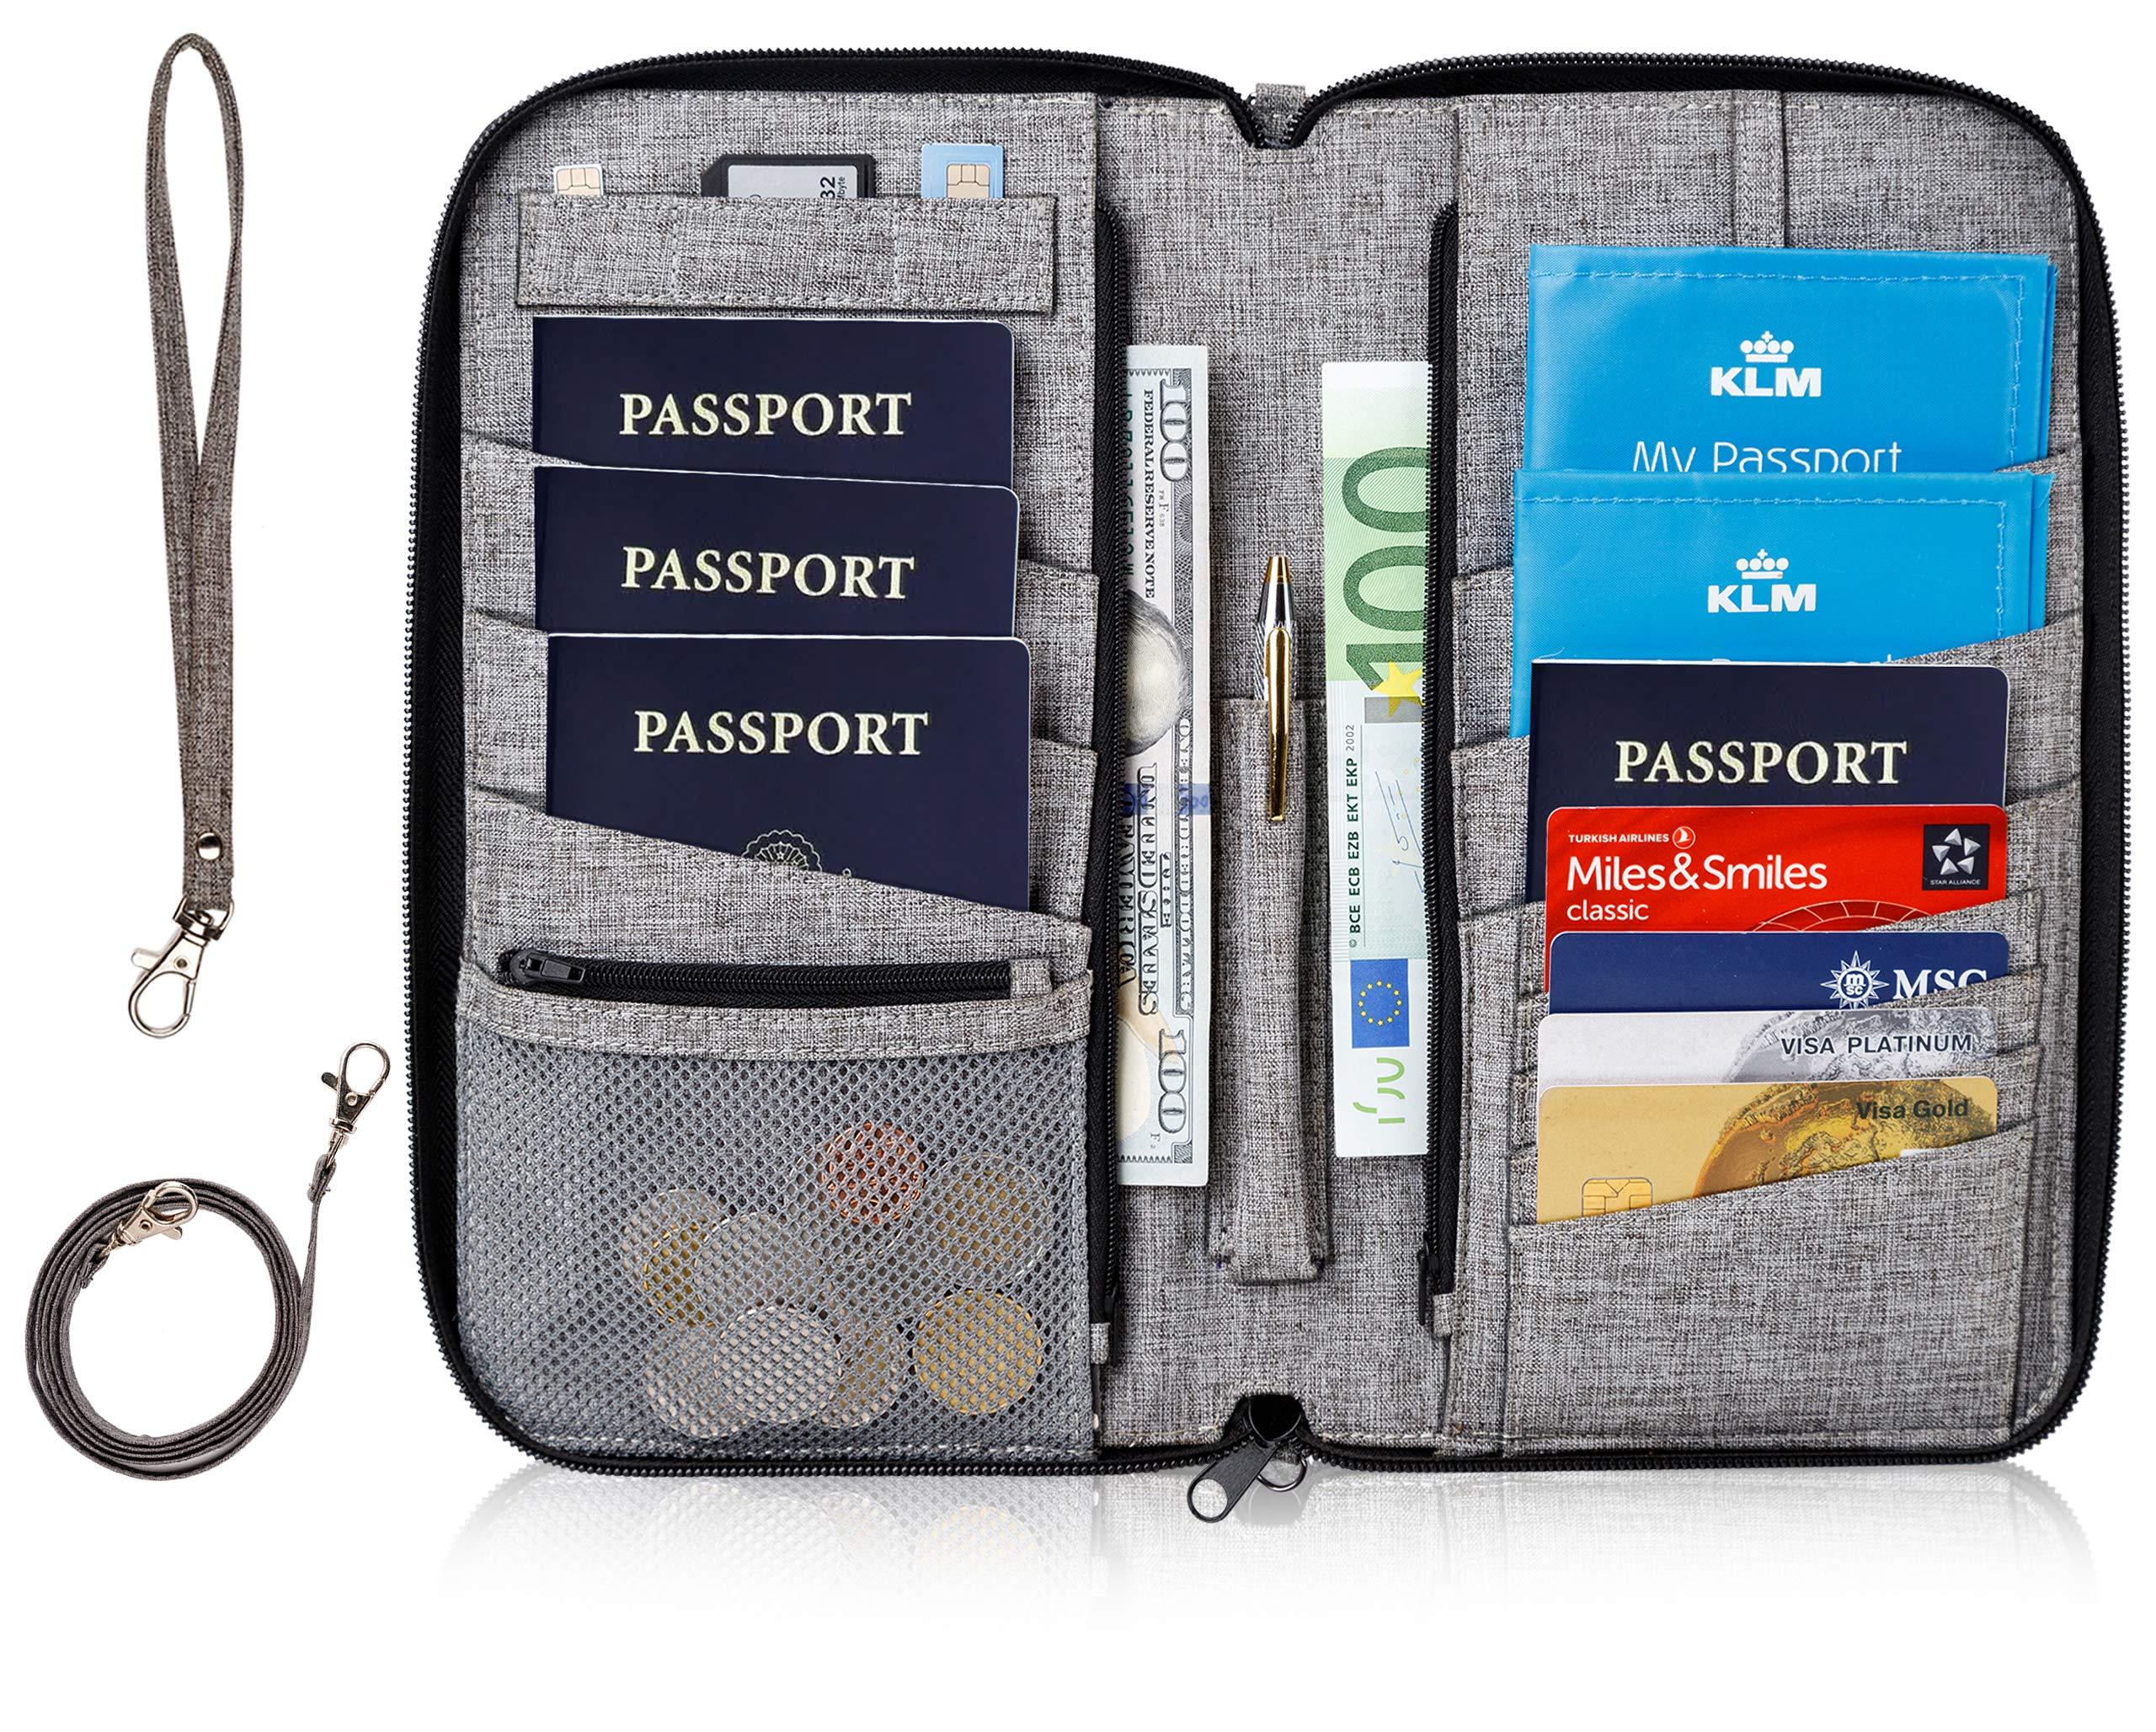 Valante Premium Family Travel Document Organizer Capacious RFID Passport Holder Wallet